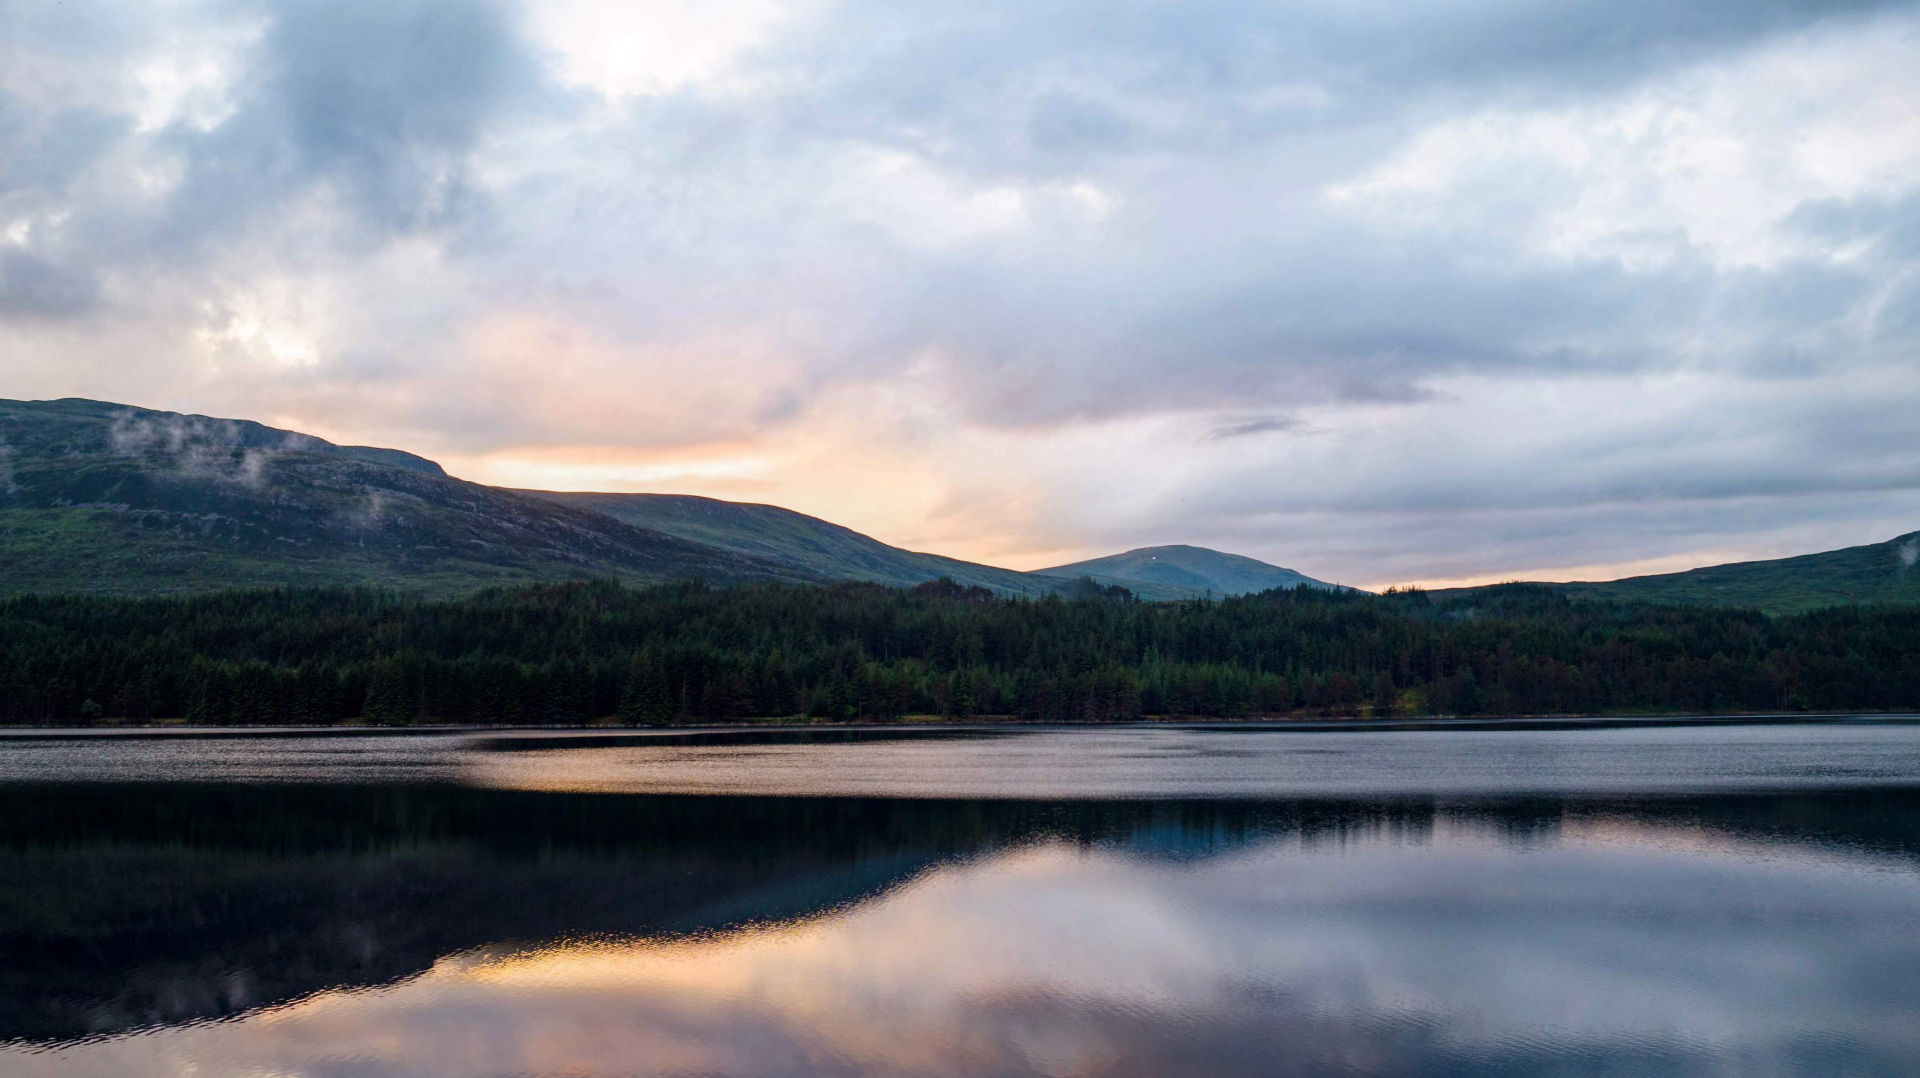 Reflections on Loch Ossian